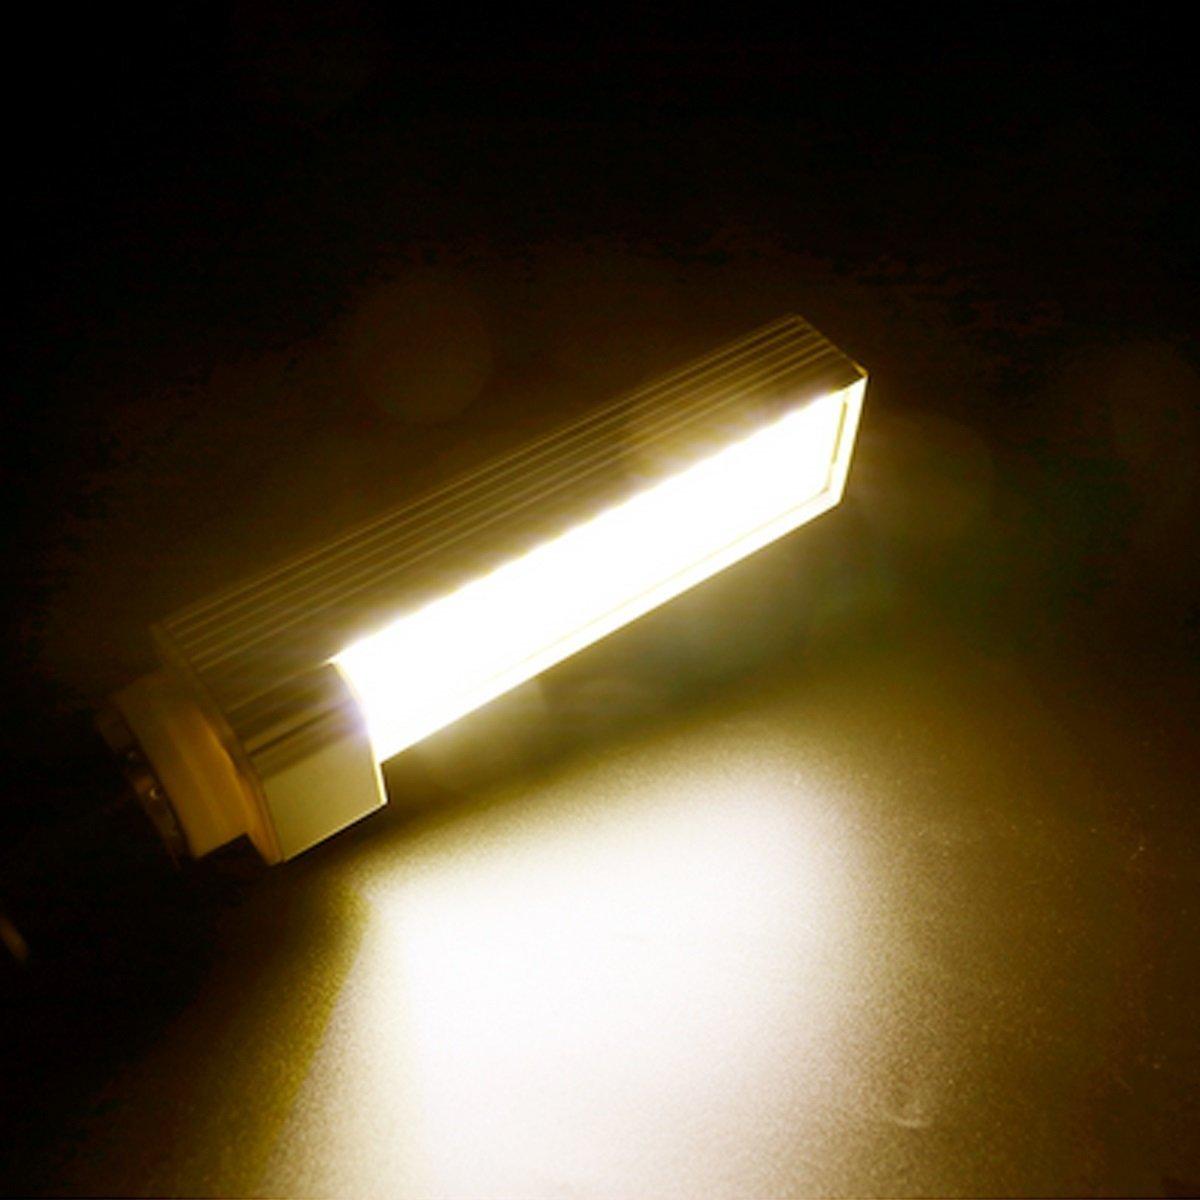 Masonanic LED 14W G24 Compact Fluorescent Lamp Rotatable Aluminum Lamp G24 E26LED CFL/Compact Fluorescent Lamp,35W CFL Equivalent (3000K Warm White, 1 Pack)